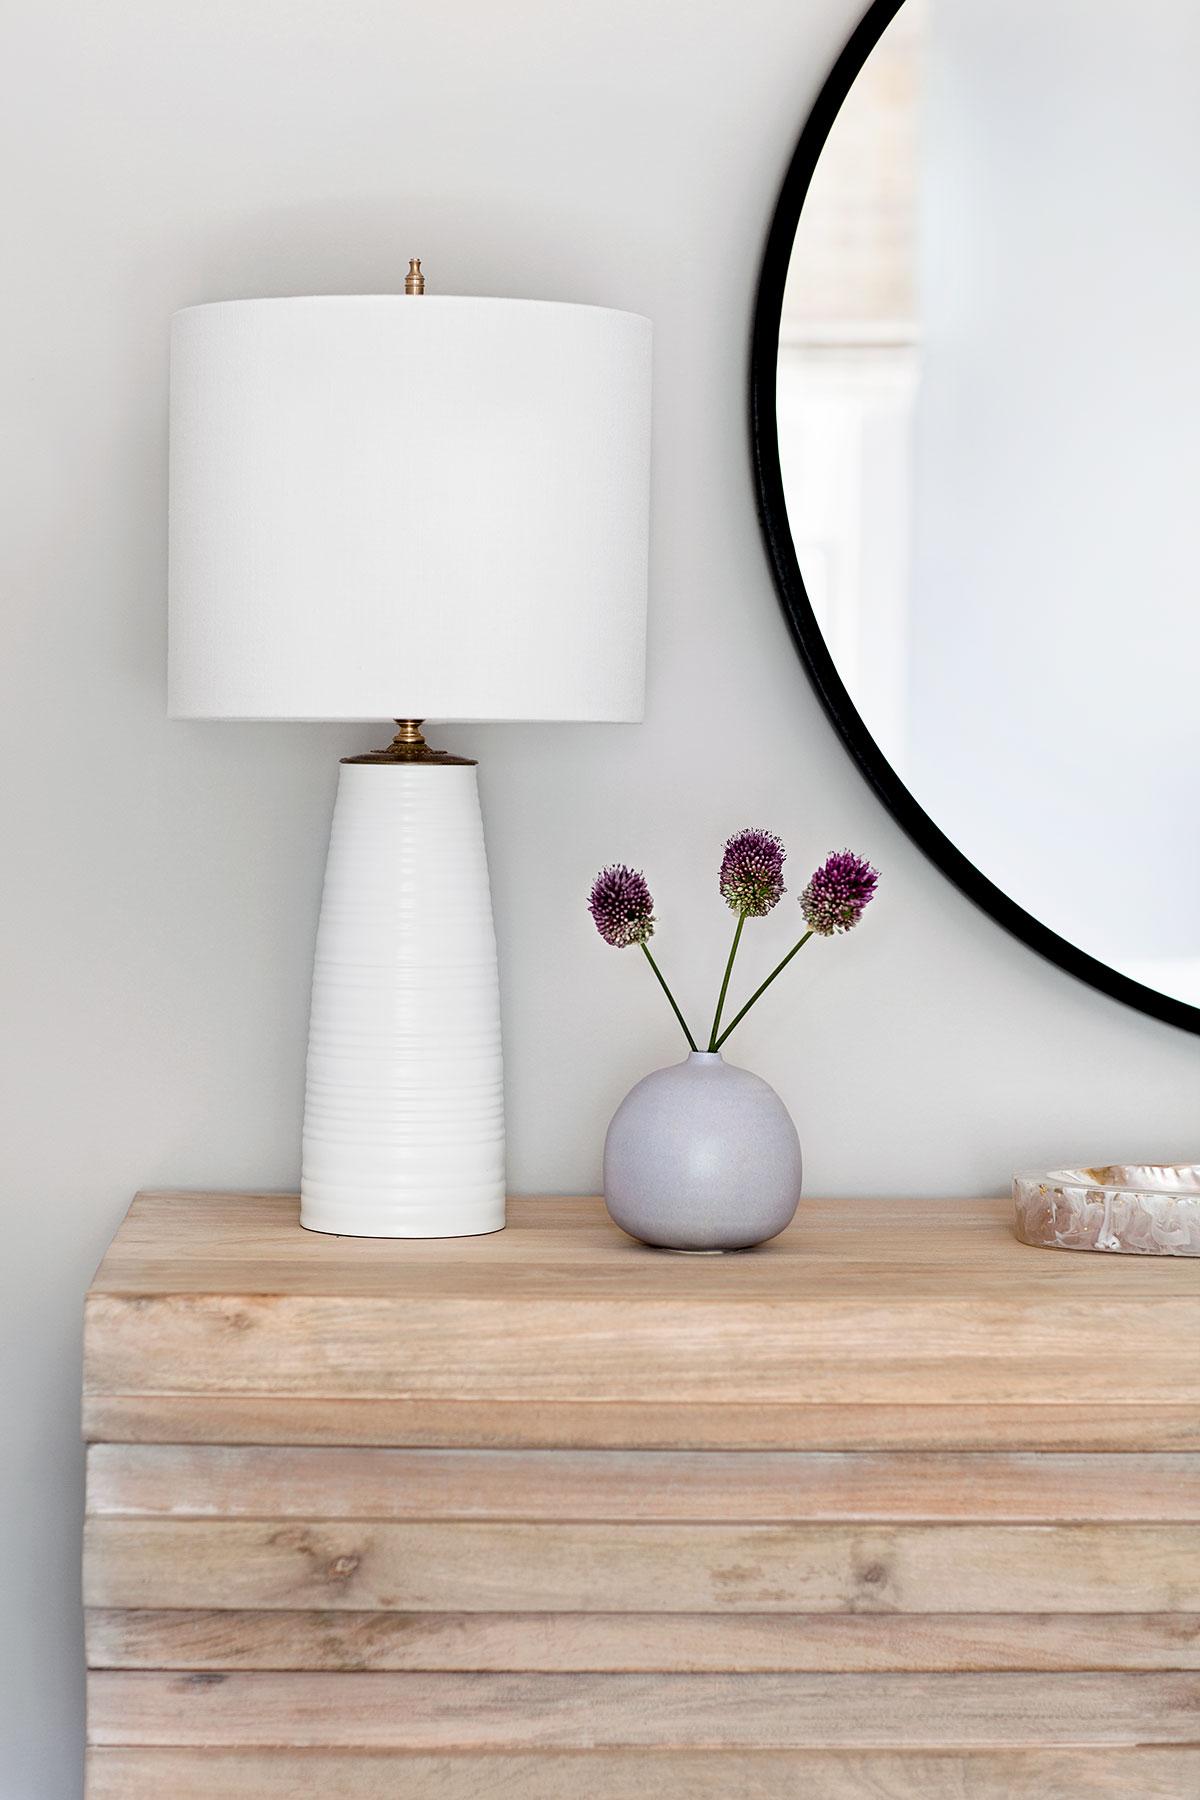 dresser-with-lamp